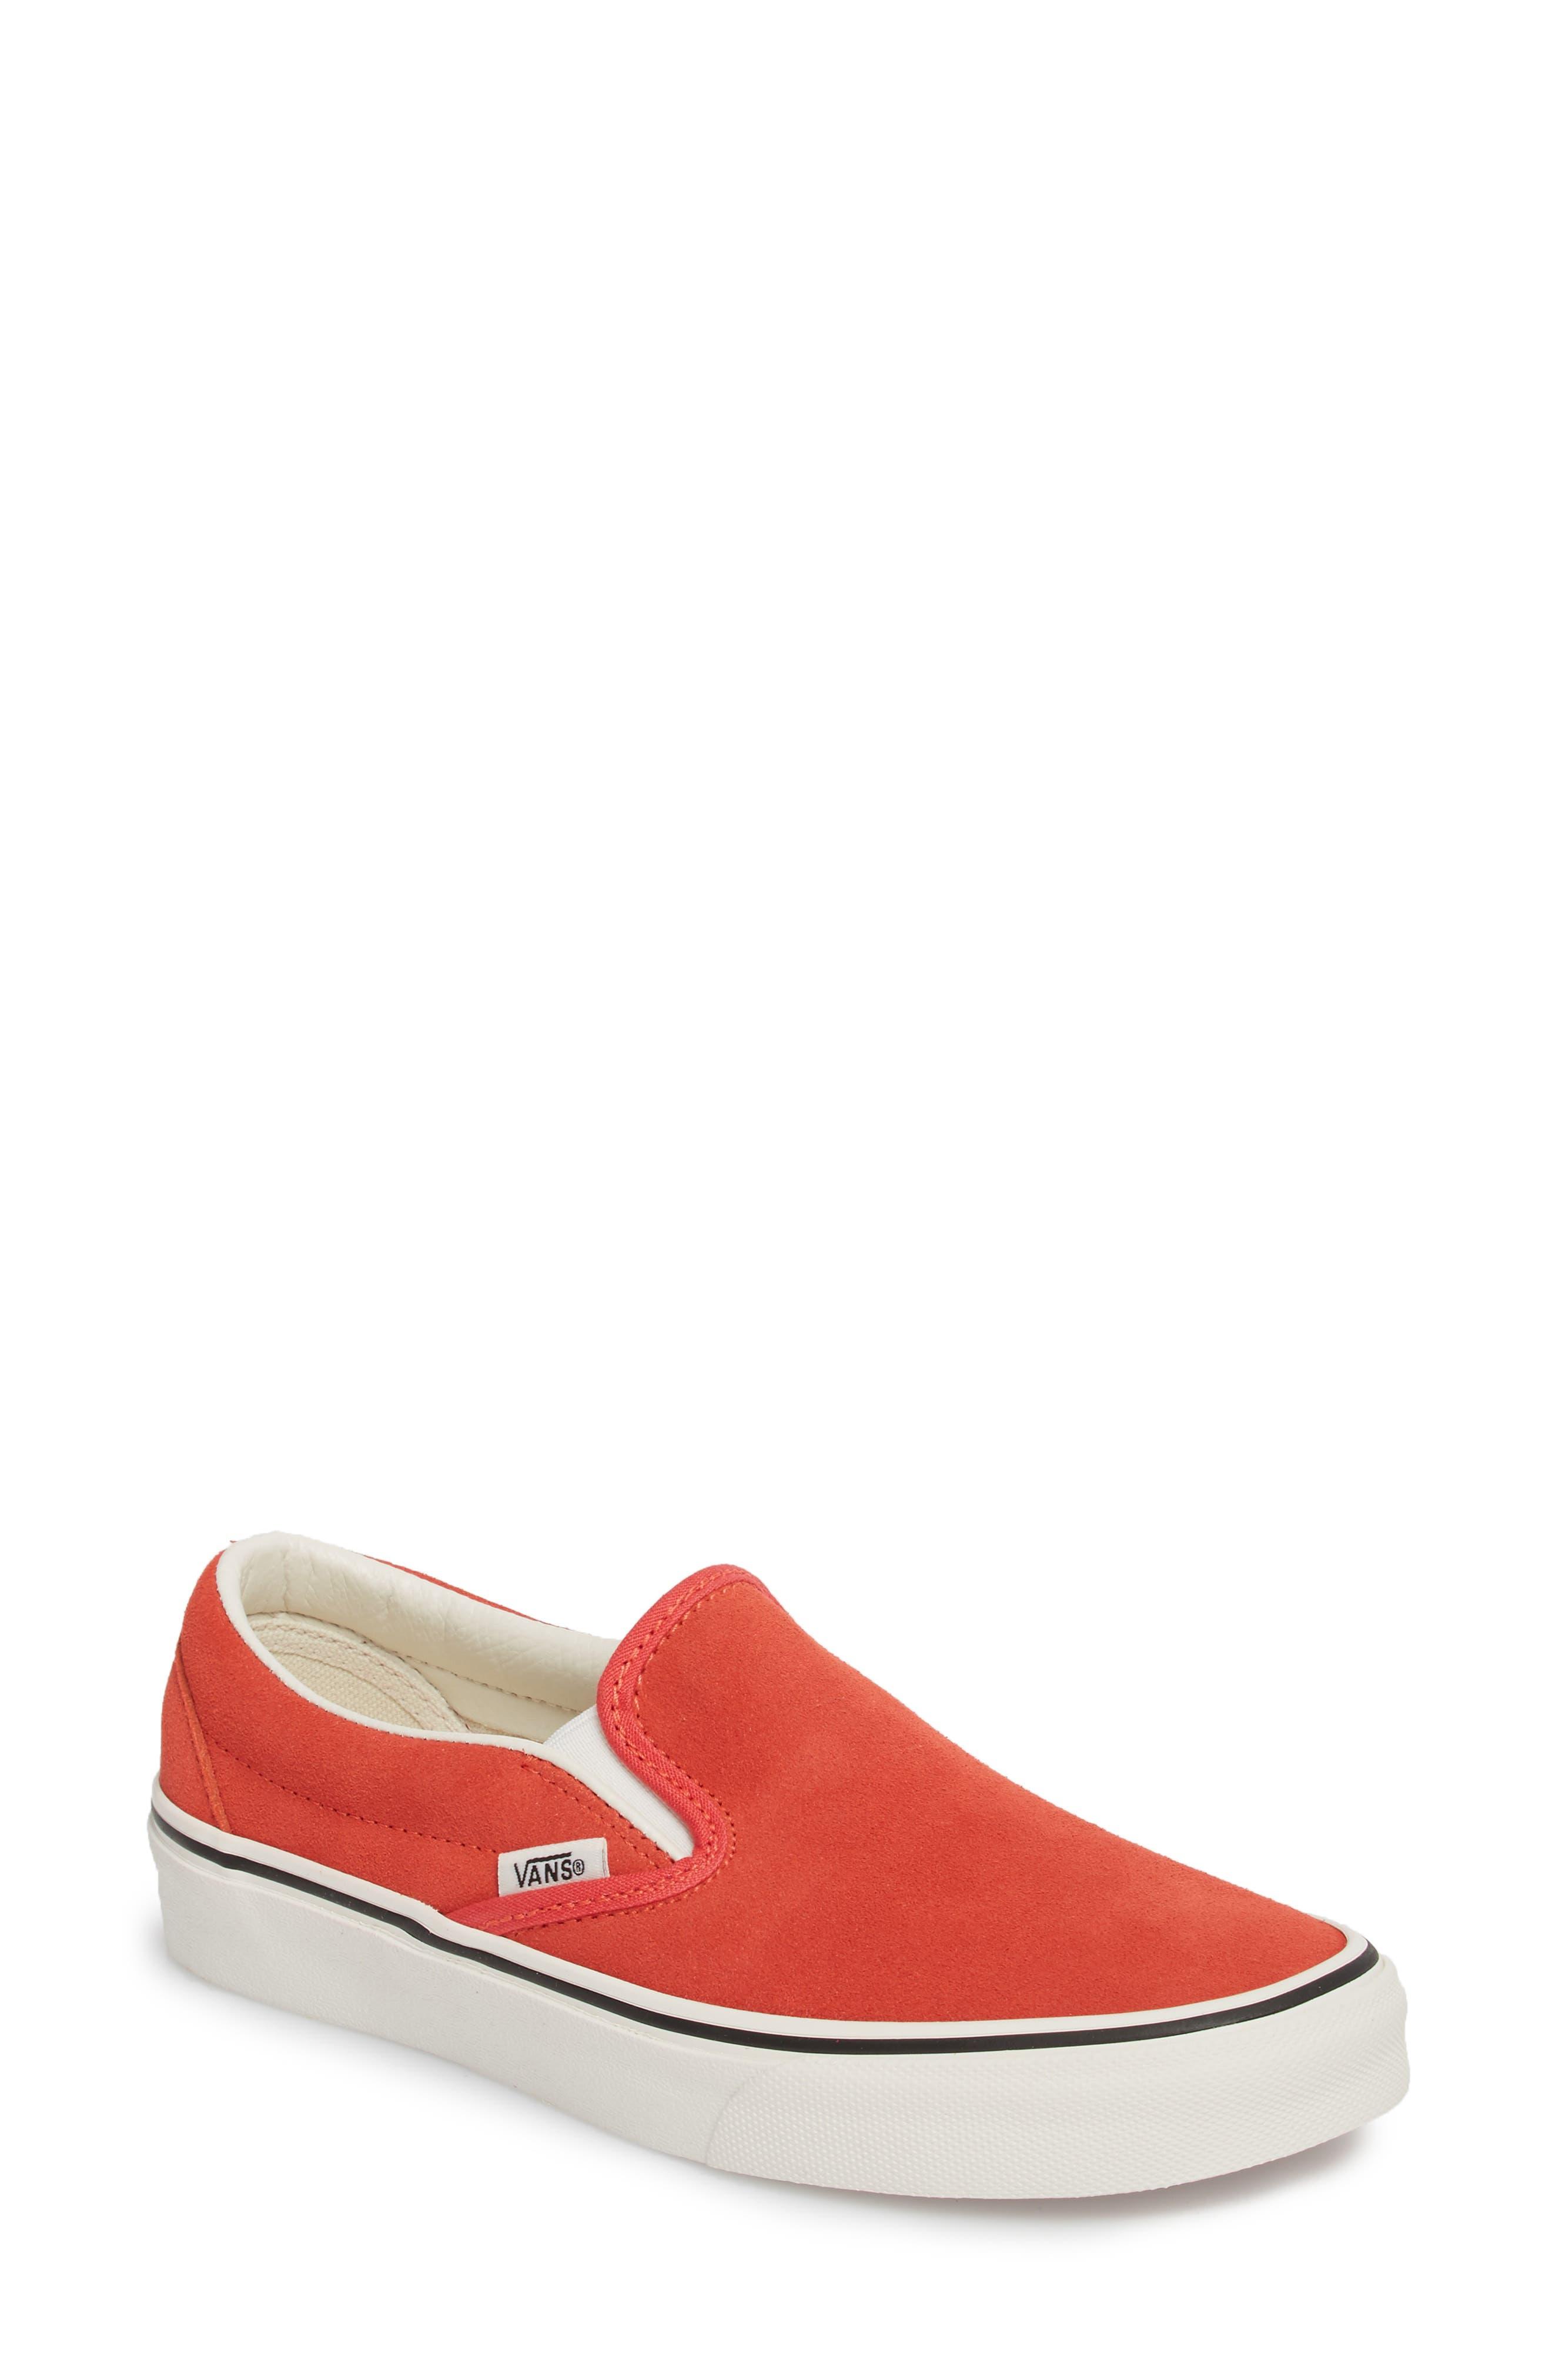 ,                             Classic Slip-On Sneaker,                             Main thumbnail 189, color,                             620